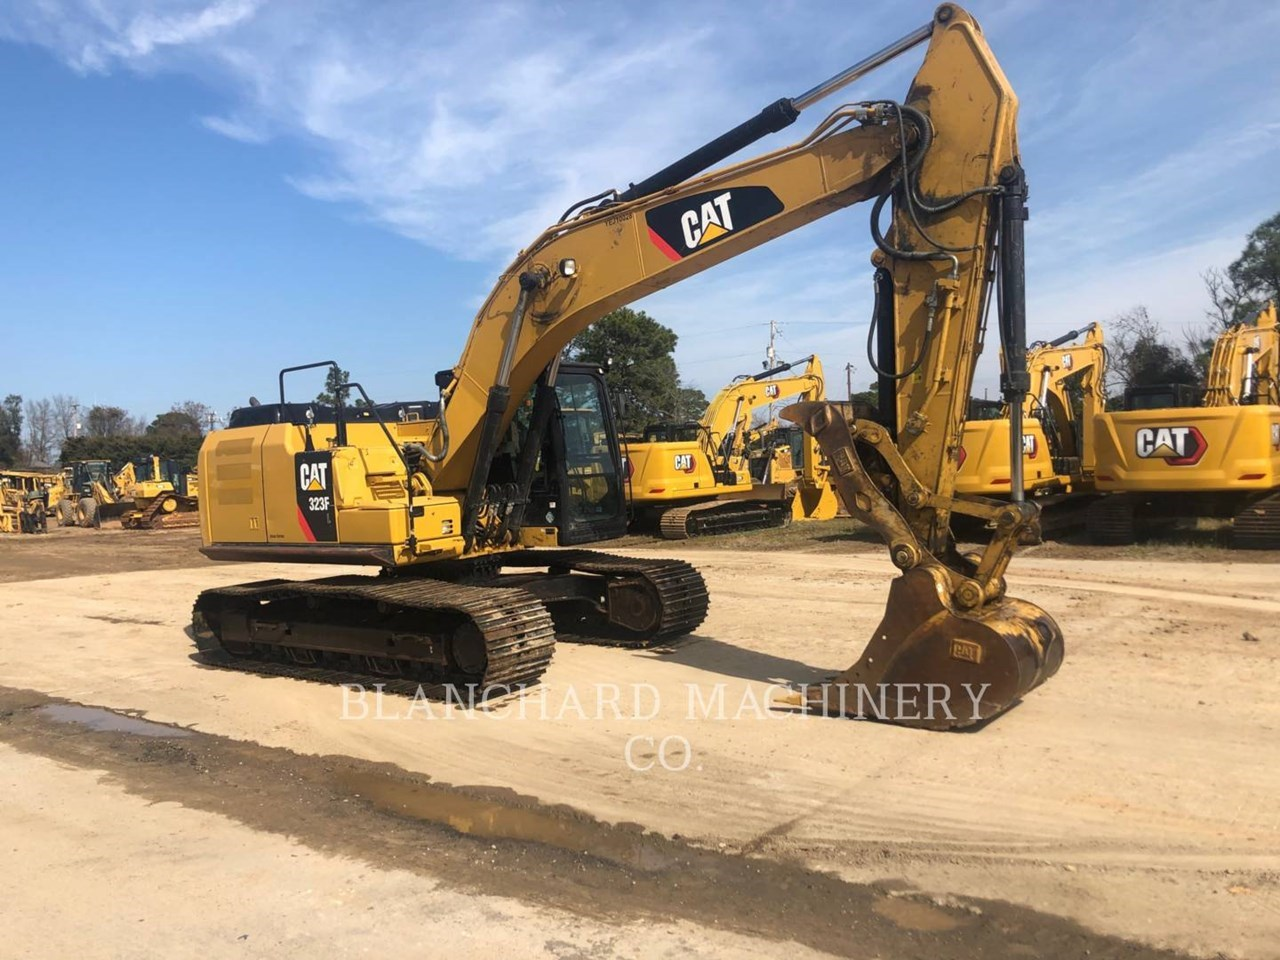 2017 Caterpillar 323FL Image 2